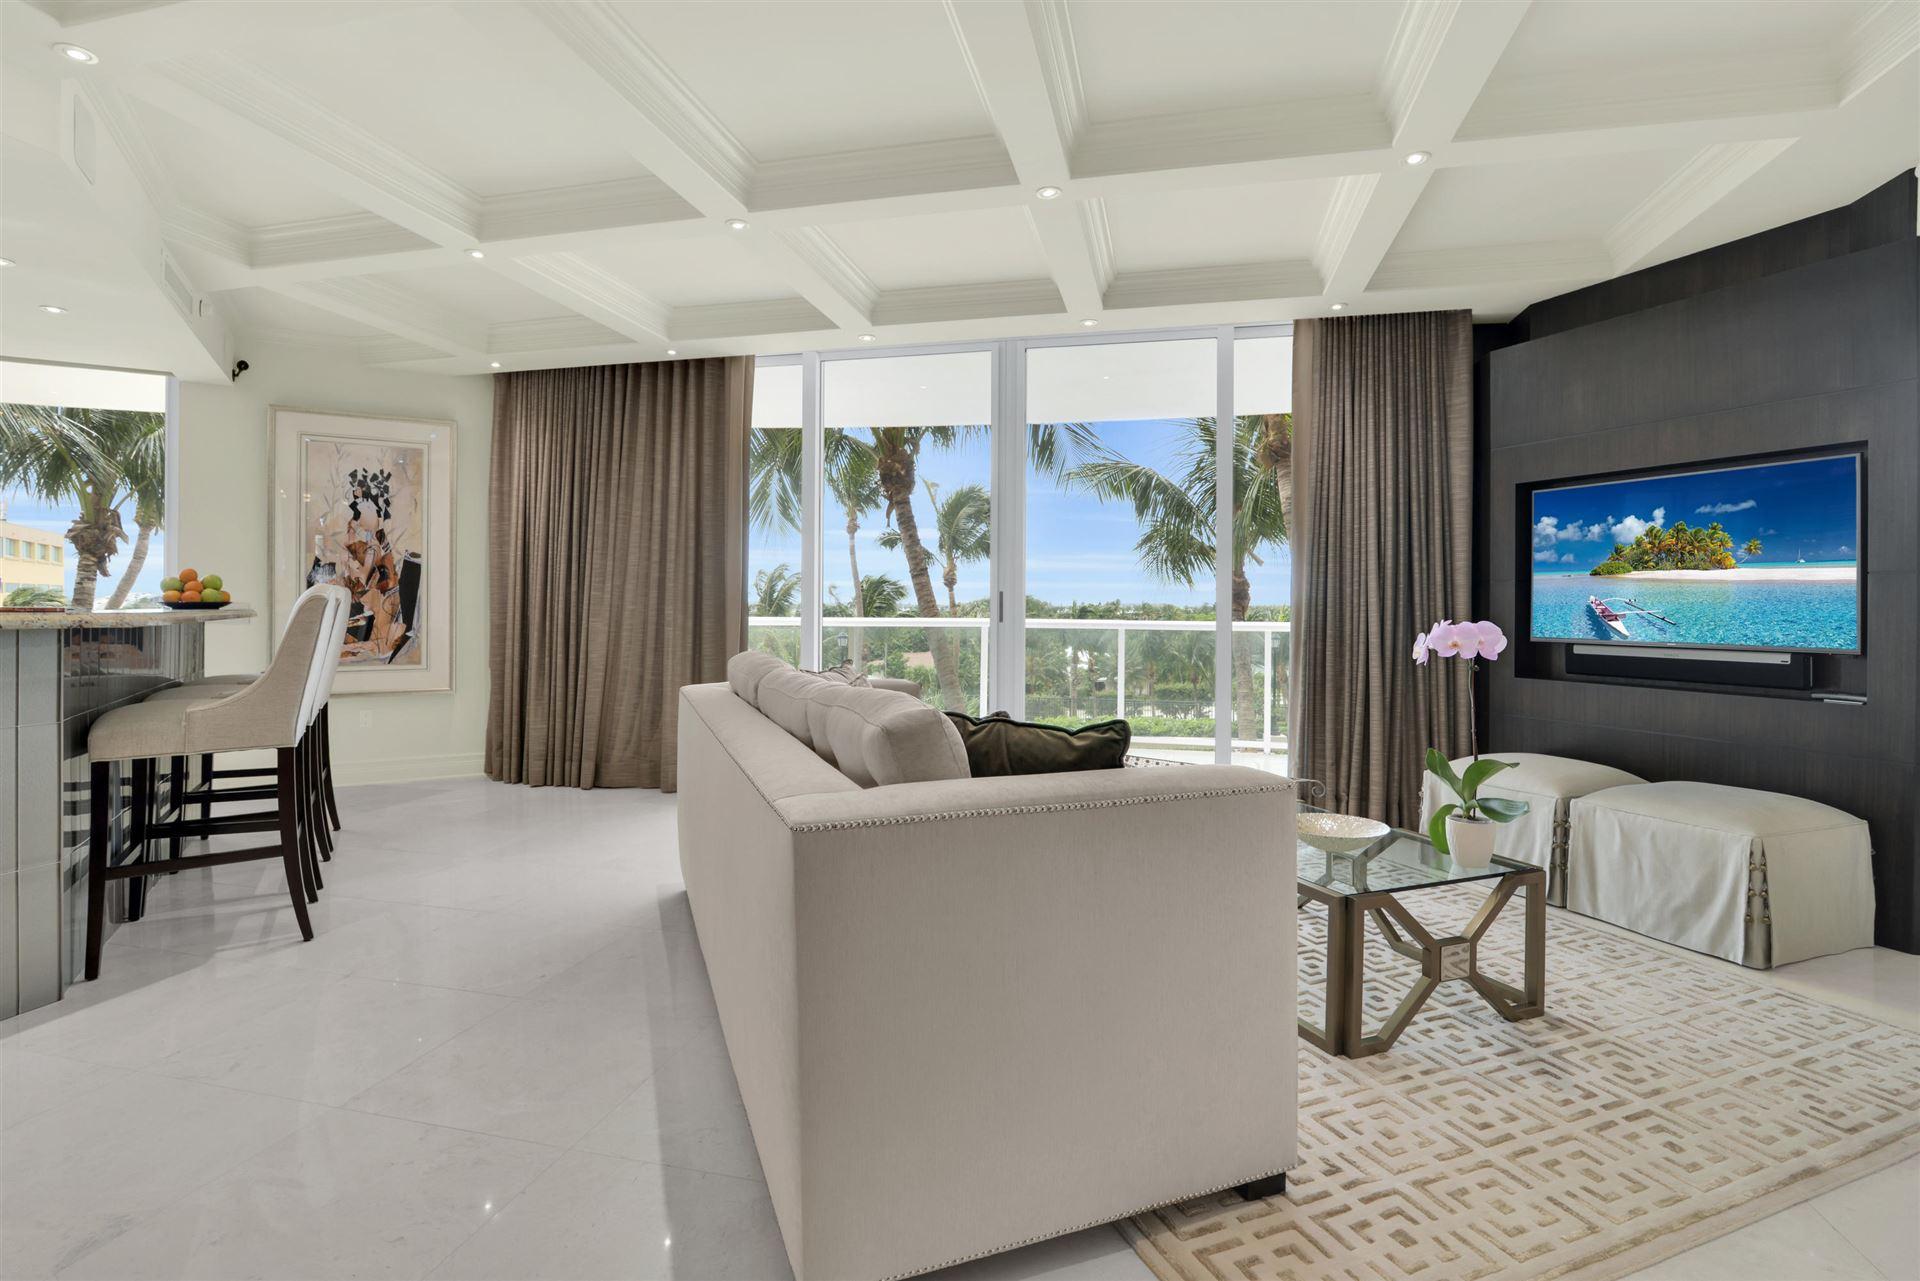 Photo of 2700 N Ocean Drive #206b, Singer Island, FL 33404 (MLS # RX-10630333)